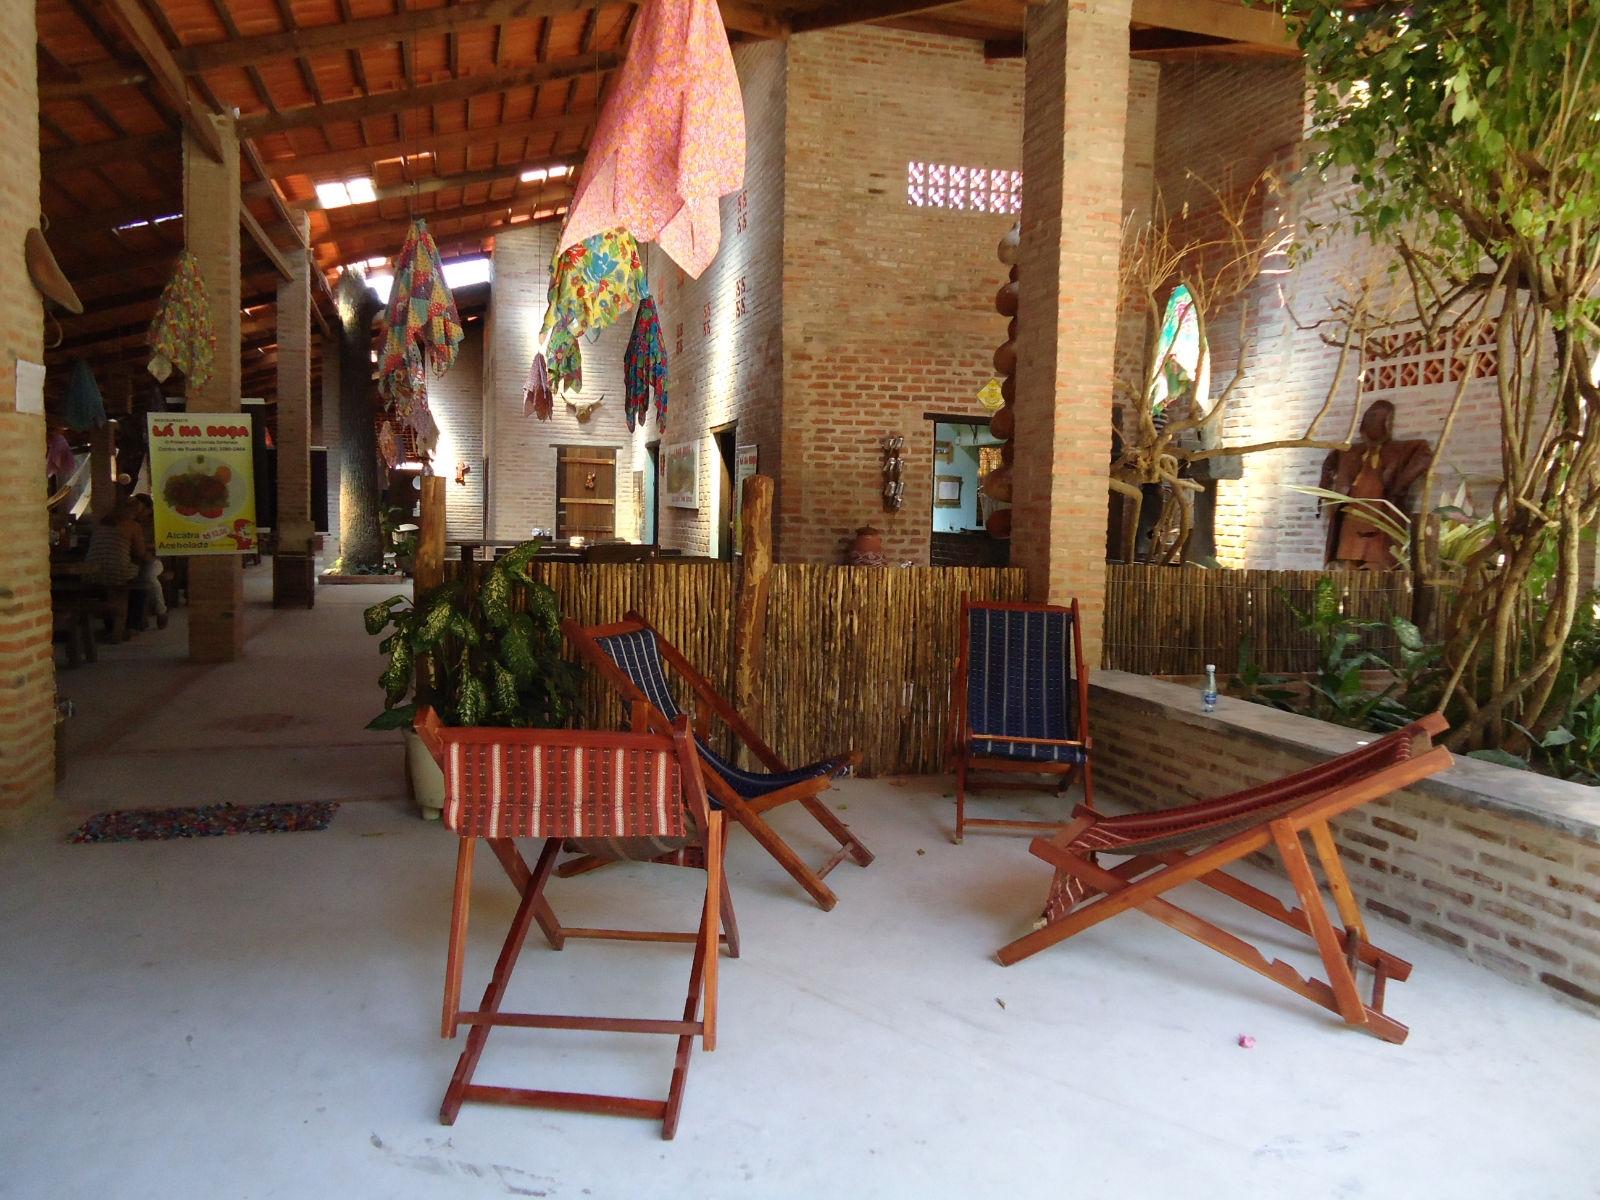 Restaurante l na ro a daniele carvalho gizelle louany for Restaurante la roca